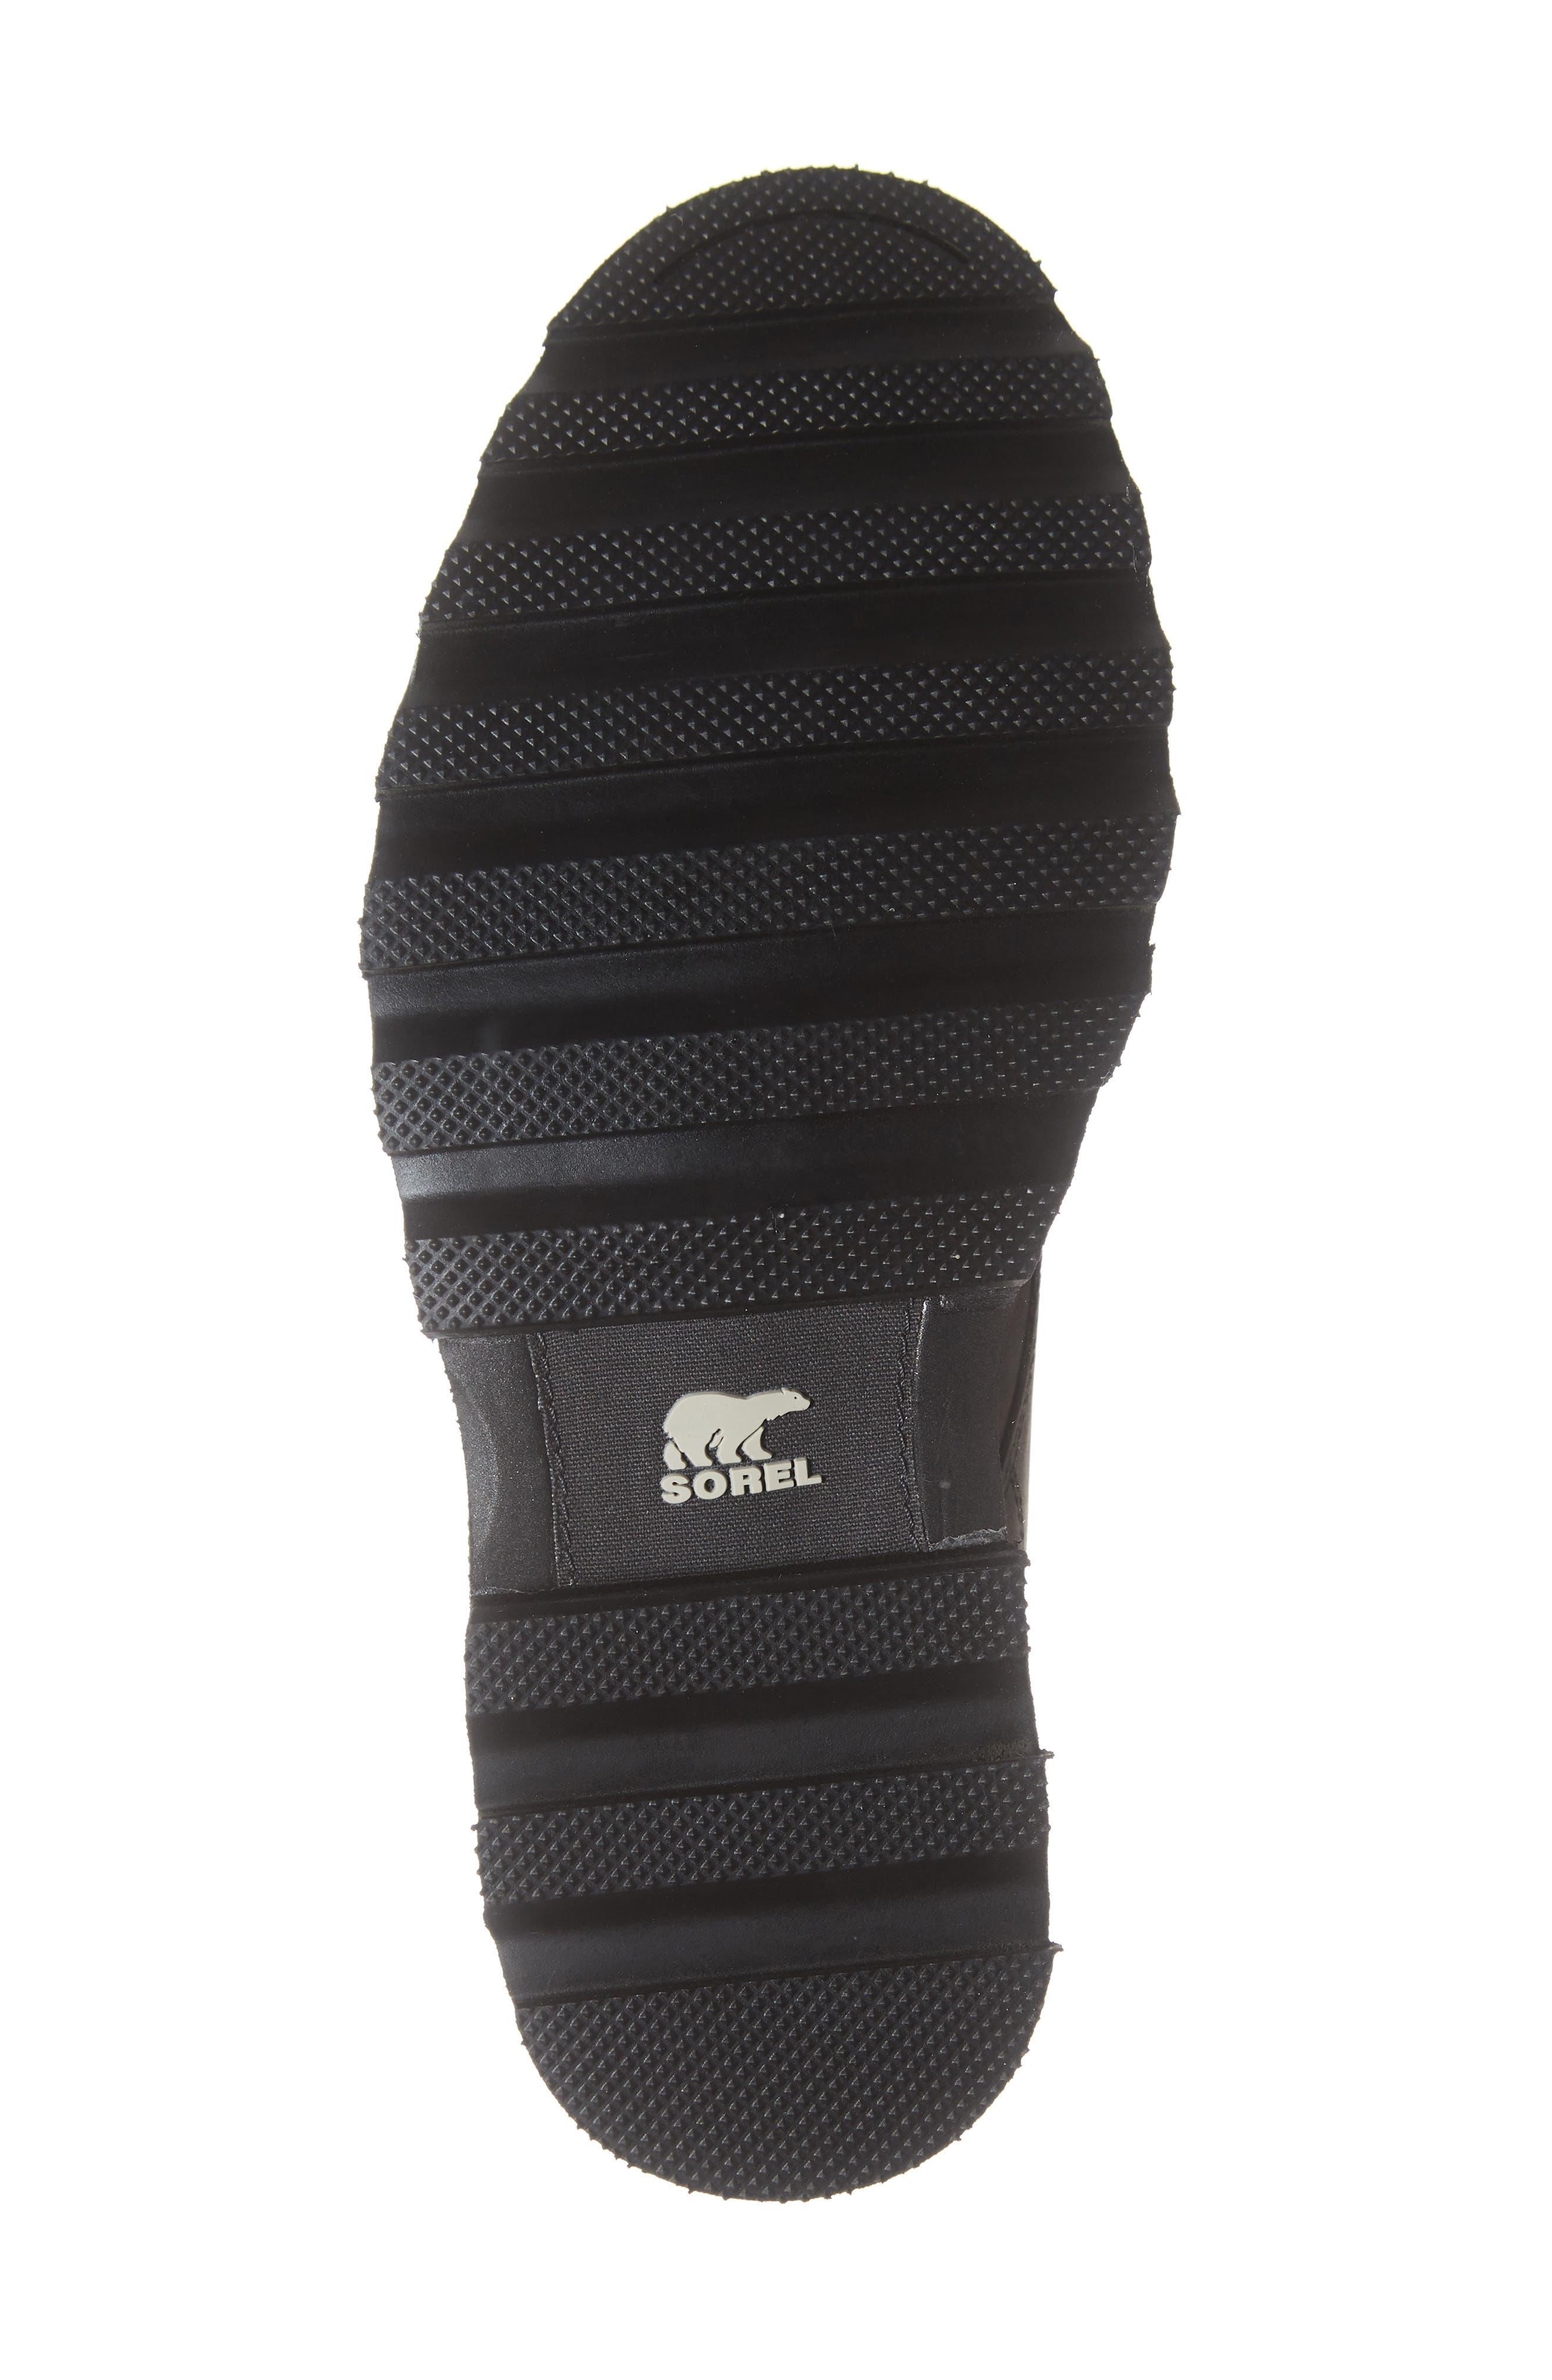 Madson Waterproof Boot,                             Alternate thumbnail 6, color,                             BLACK/ BLACK